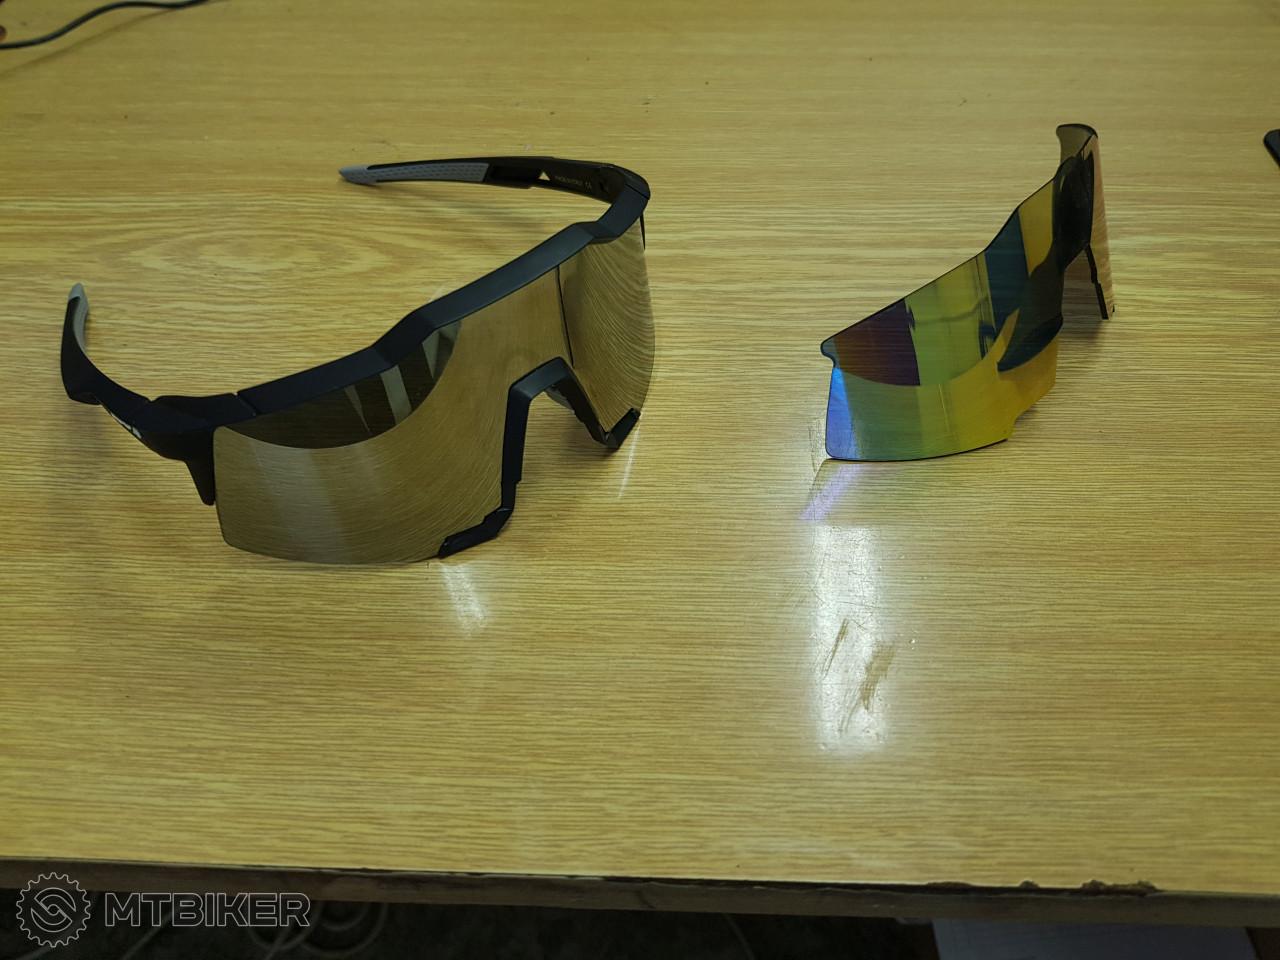 b62cd1954 100 % Okuliare Replika - Príslušenstvo - Okuliare - Bazár MTBIKER